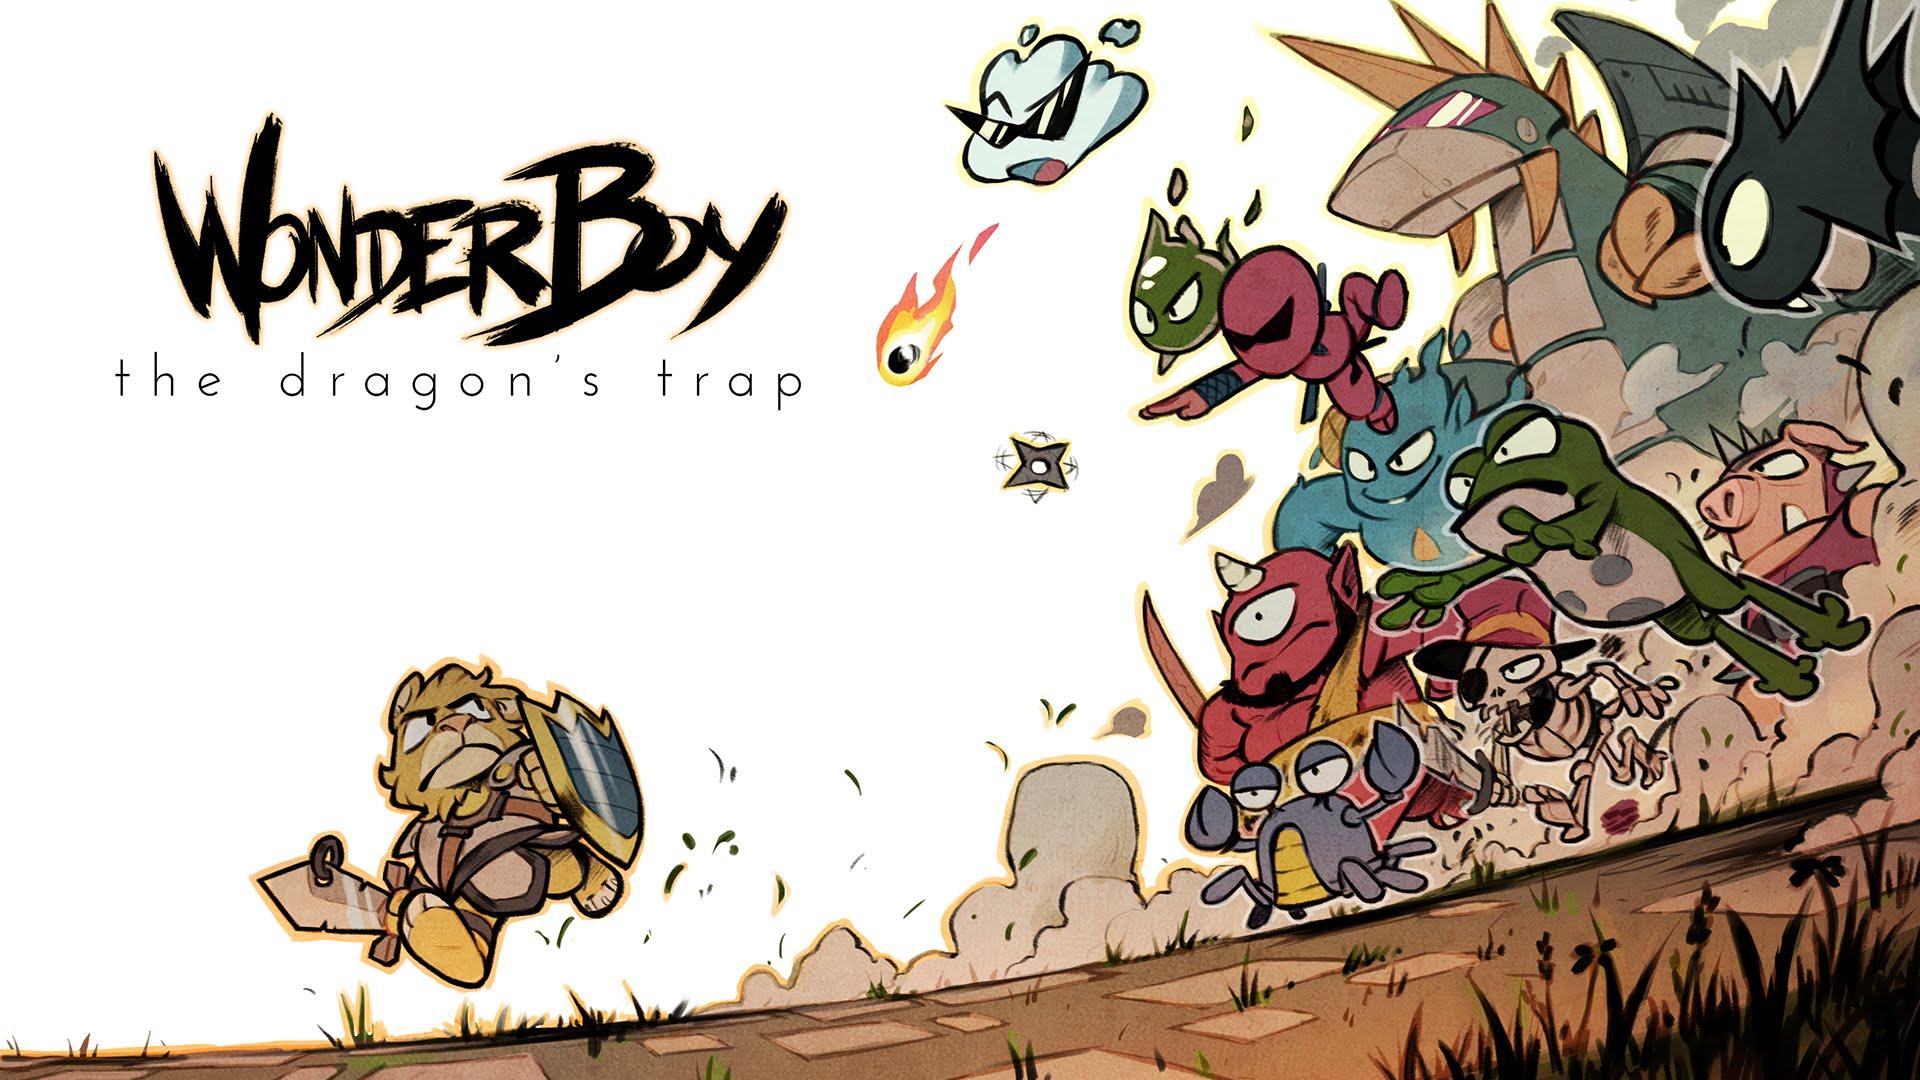 Wonder Boy The Dragon's Trap %100 Türkçe Yama